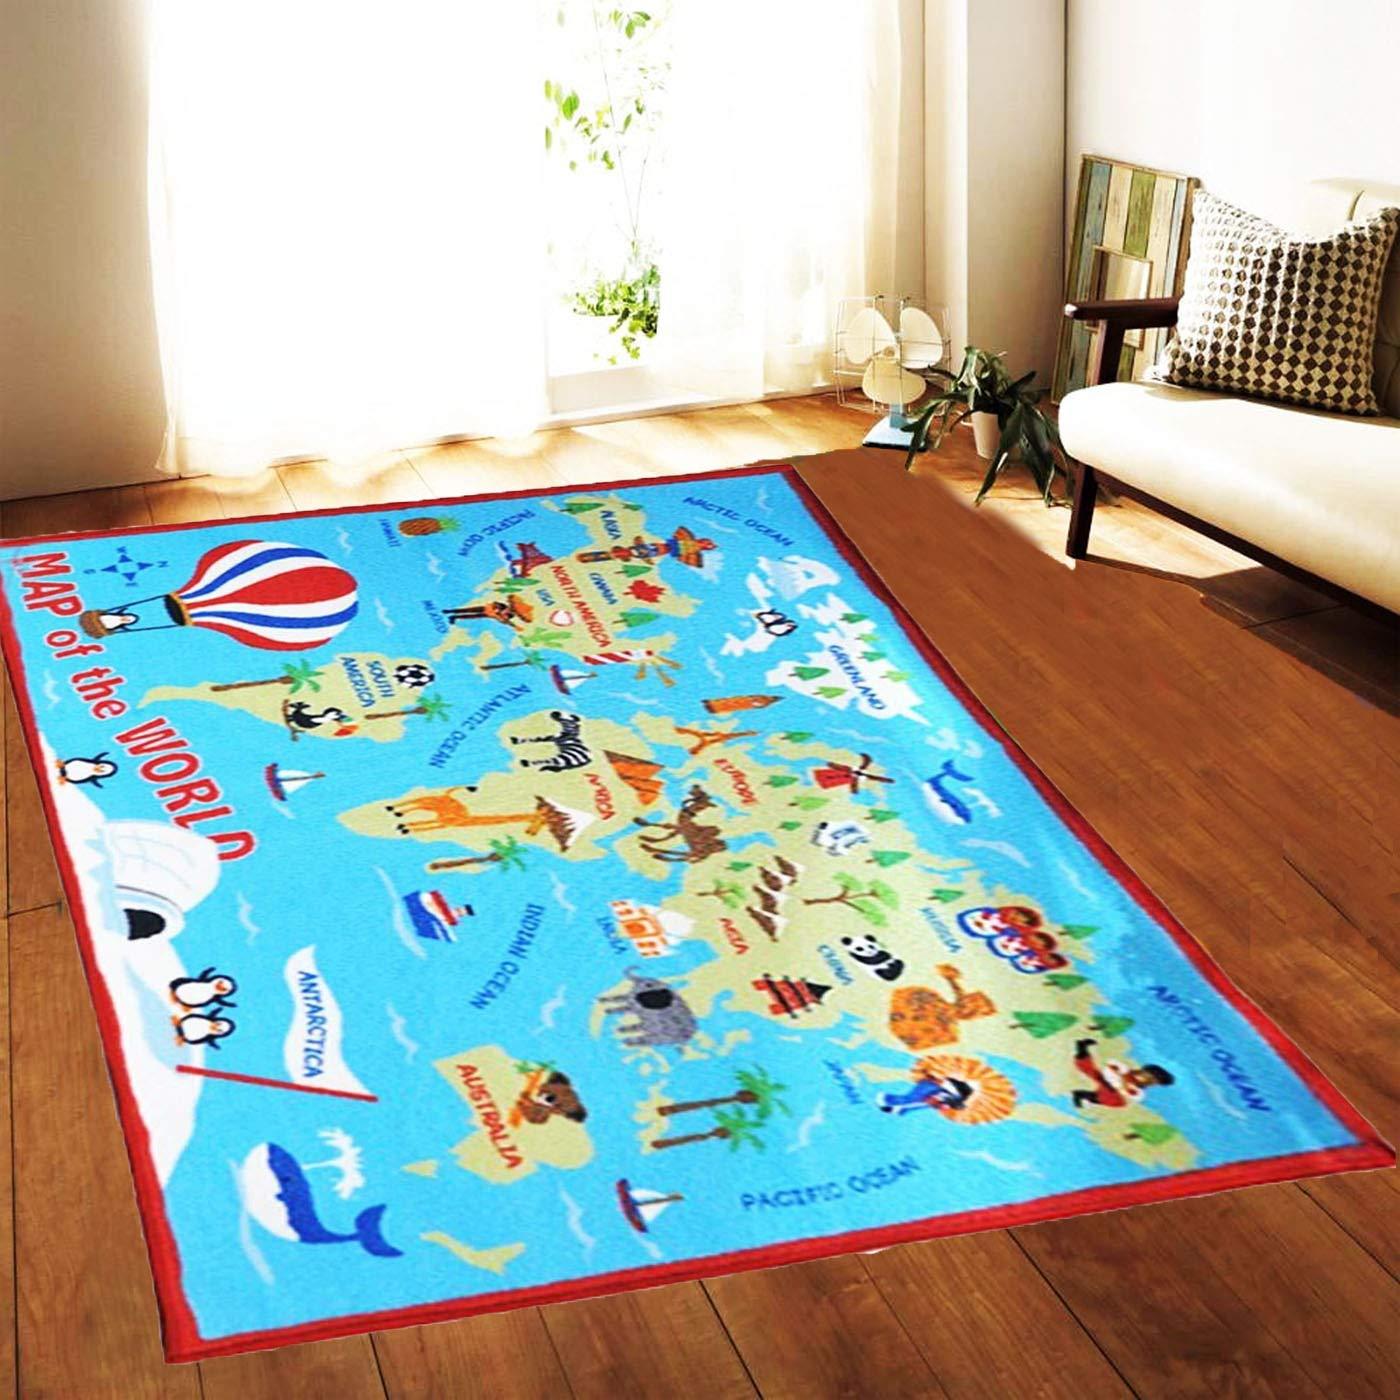 Rocket Mat Rug Carpet Nursery Bedroom Play Room Pirate Children Kids Boy